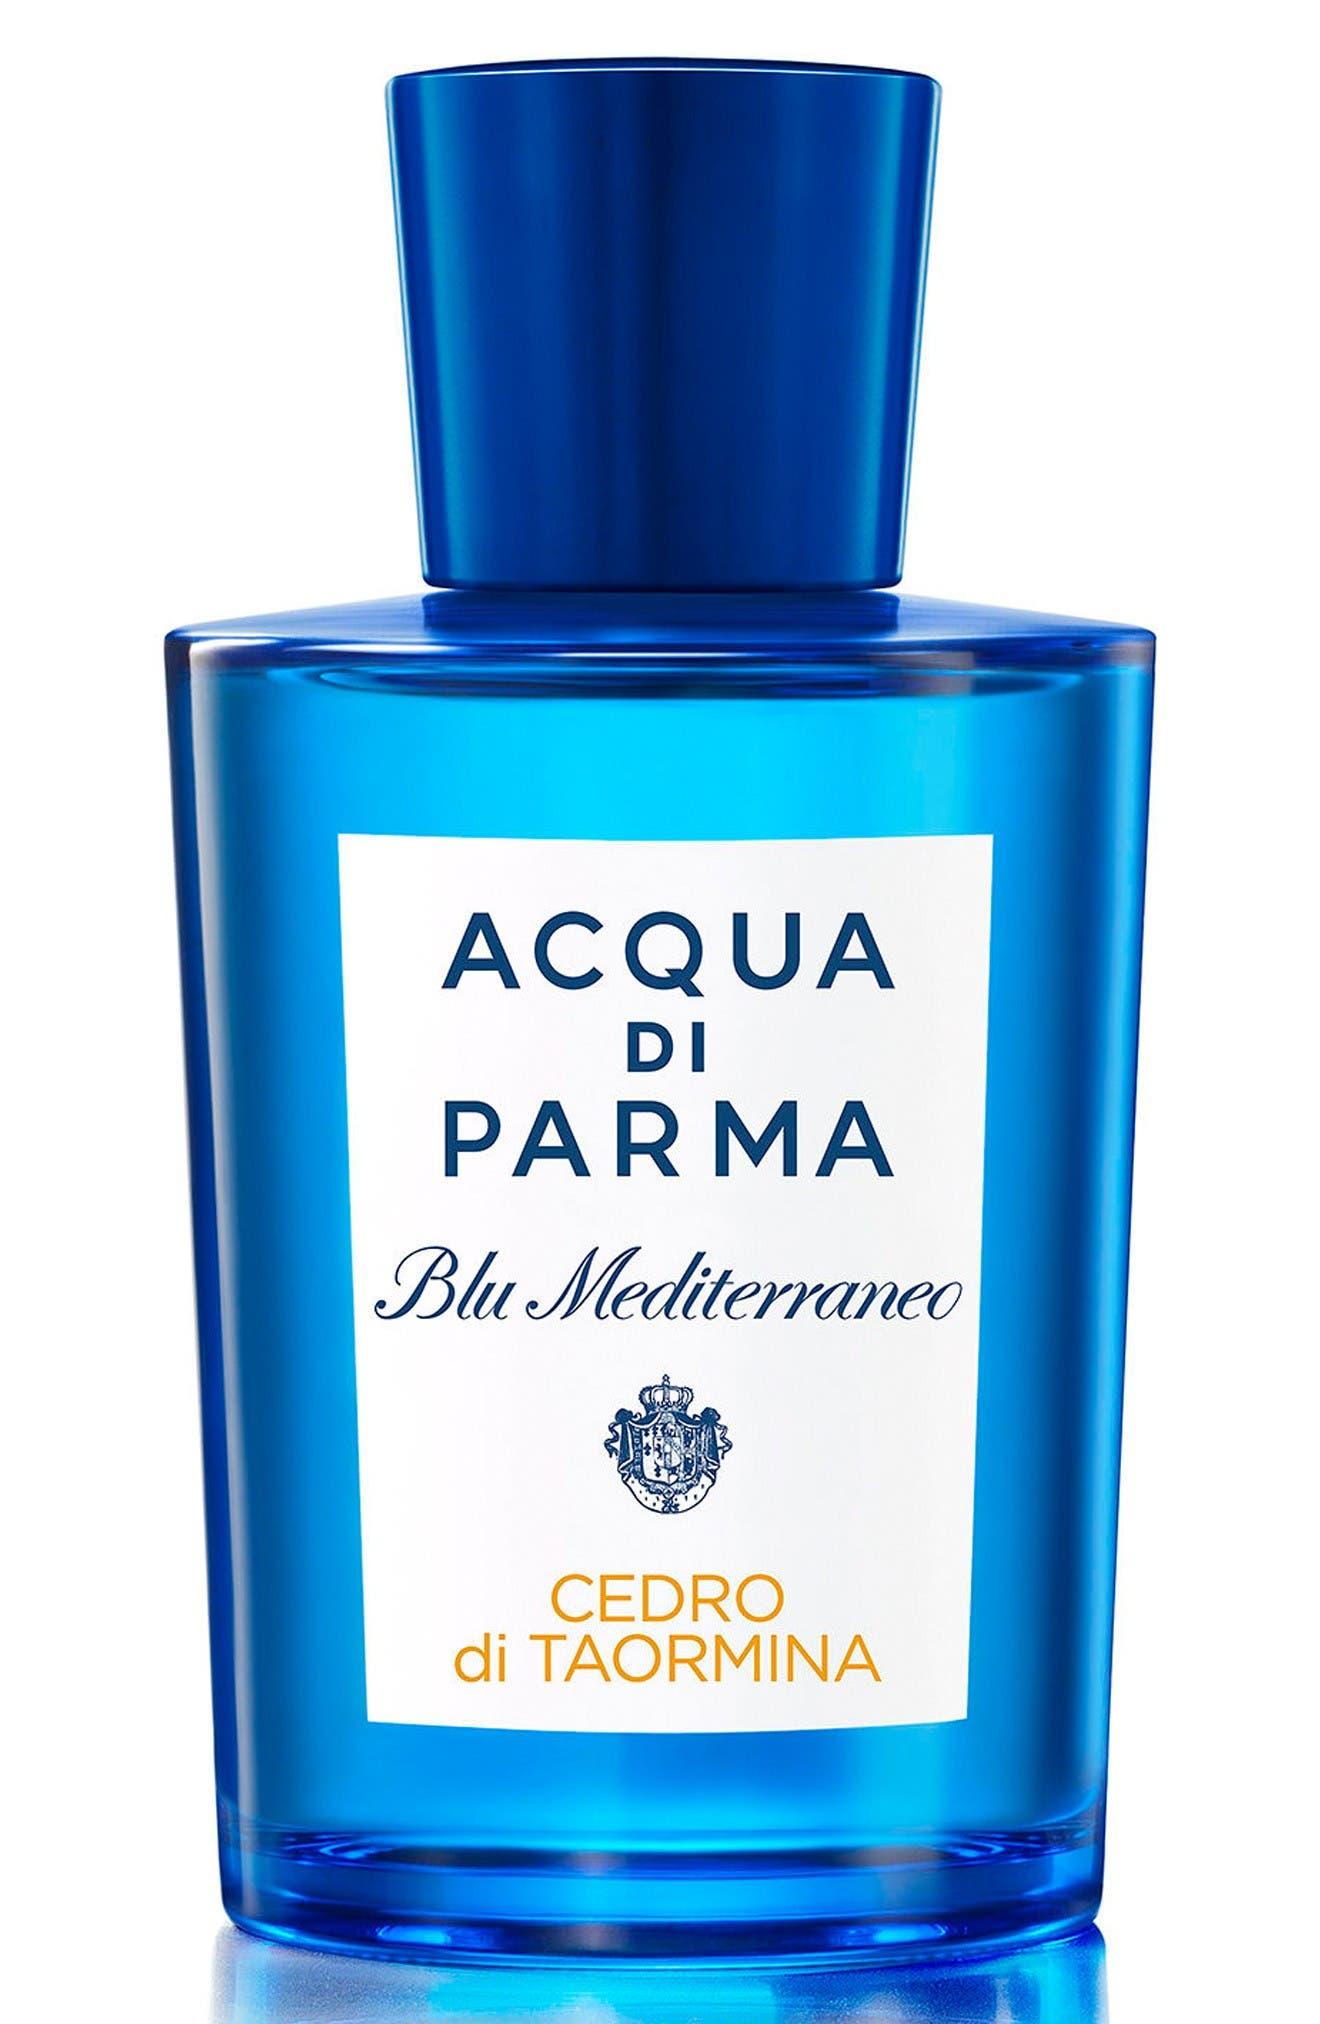 Alternate Image 1 Selected - Acqua di Parma 'Blu Mediterraneo Cedro di Taormina' Eau de Toilette